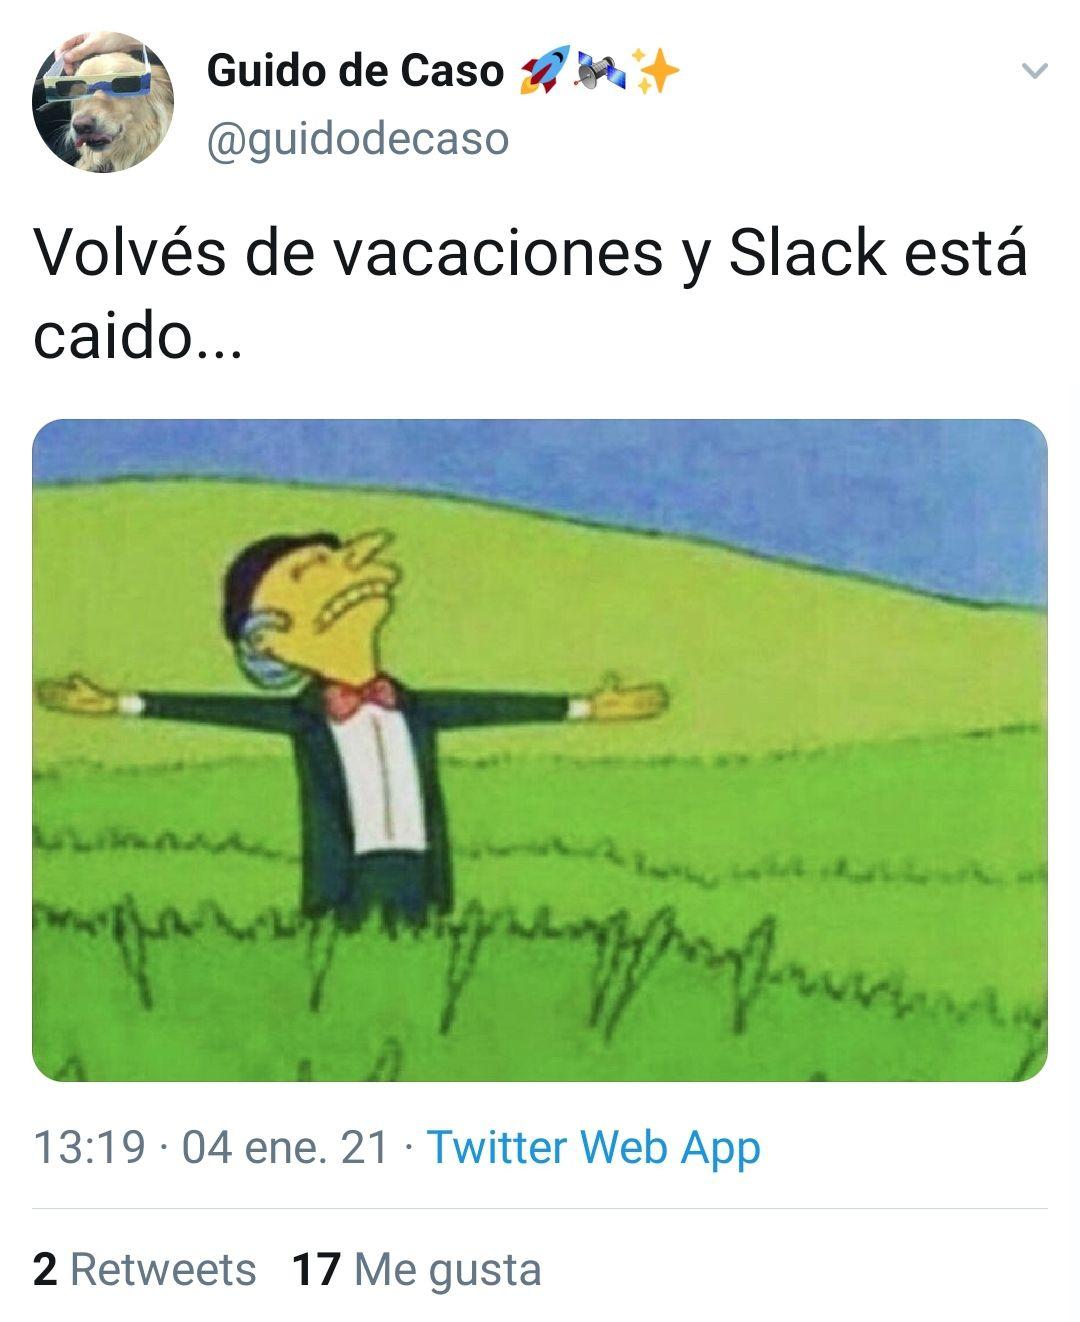 Memes por la caída de slack